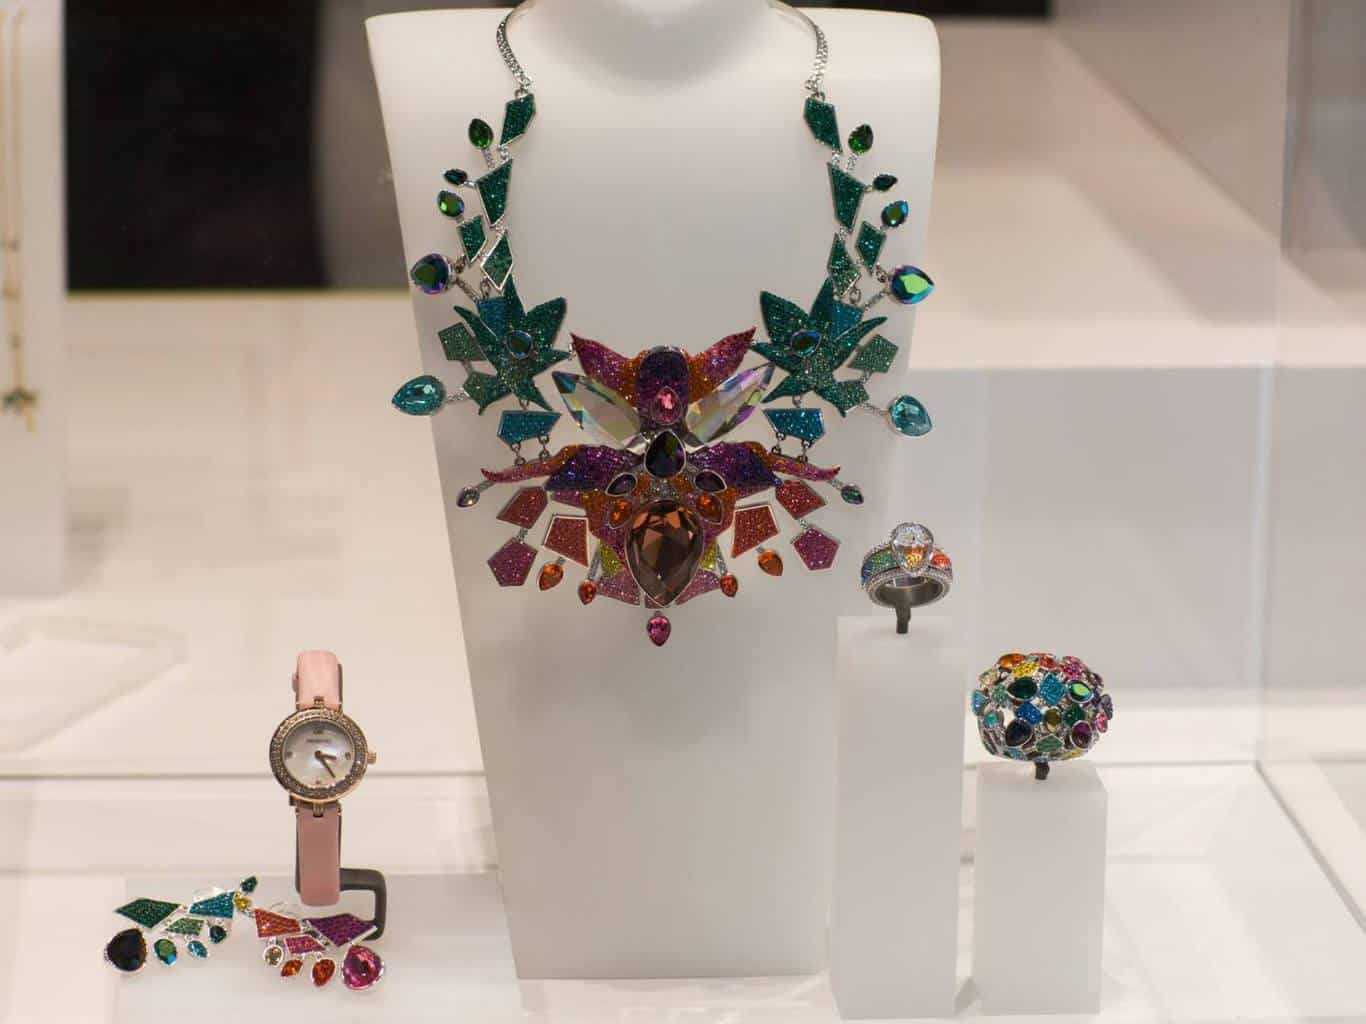 Swarovski jewellery at Basel World 2018